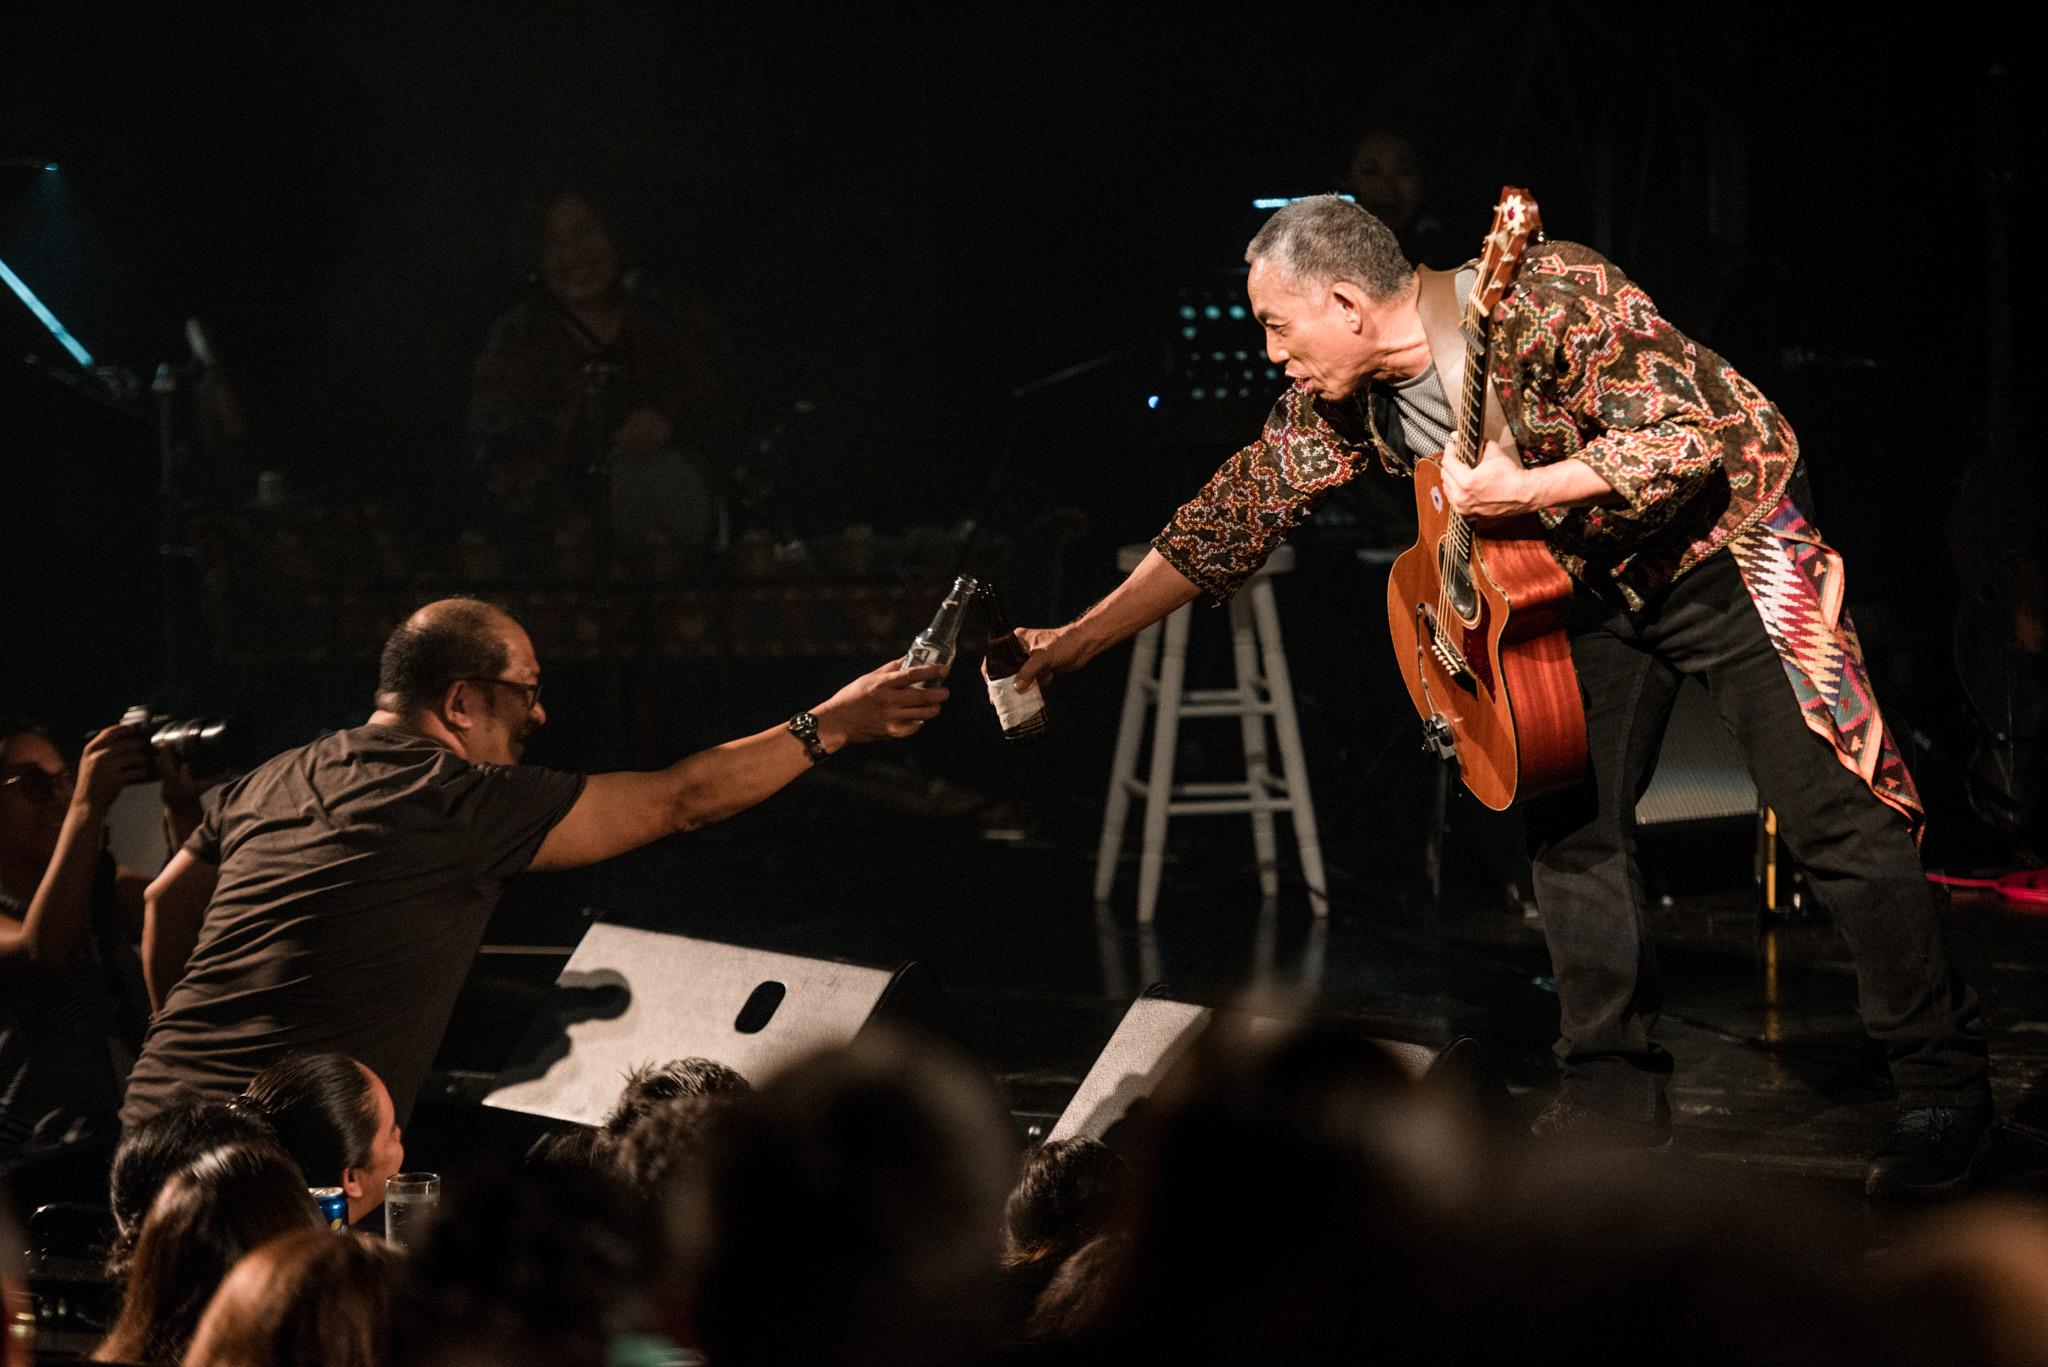 Photo by Martin San Diego/ Rappler